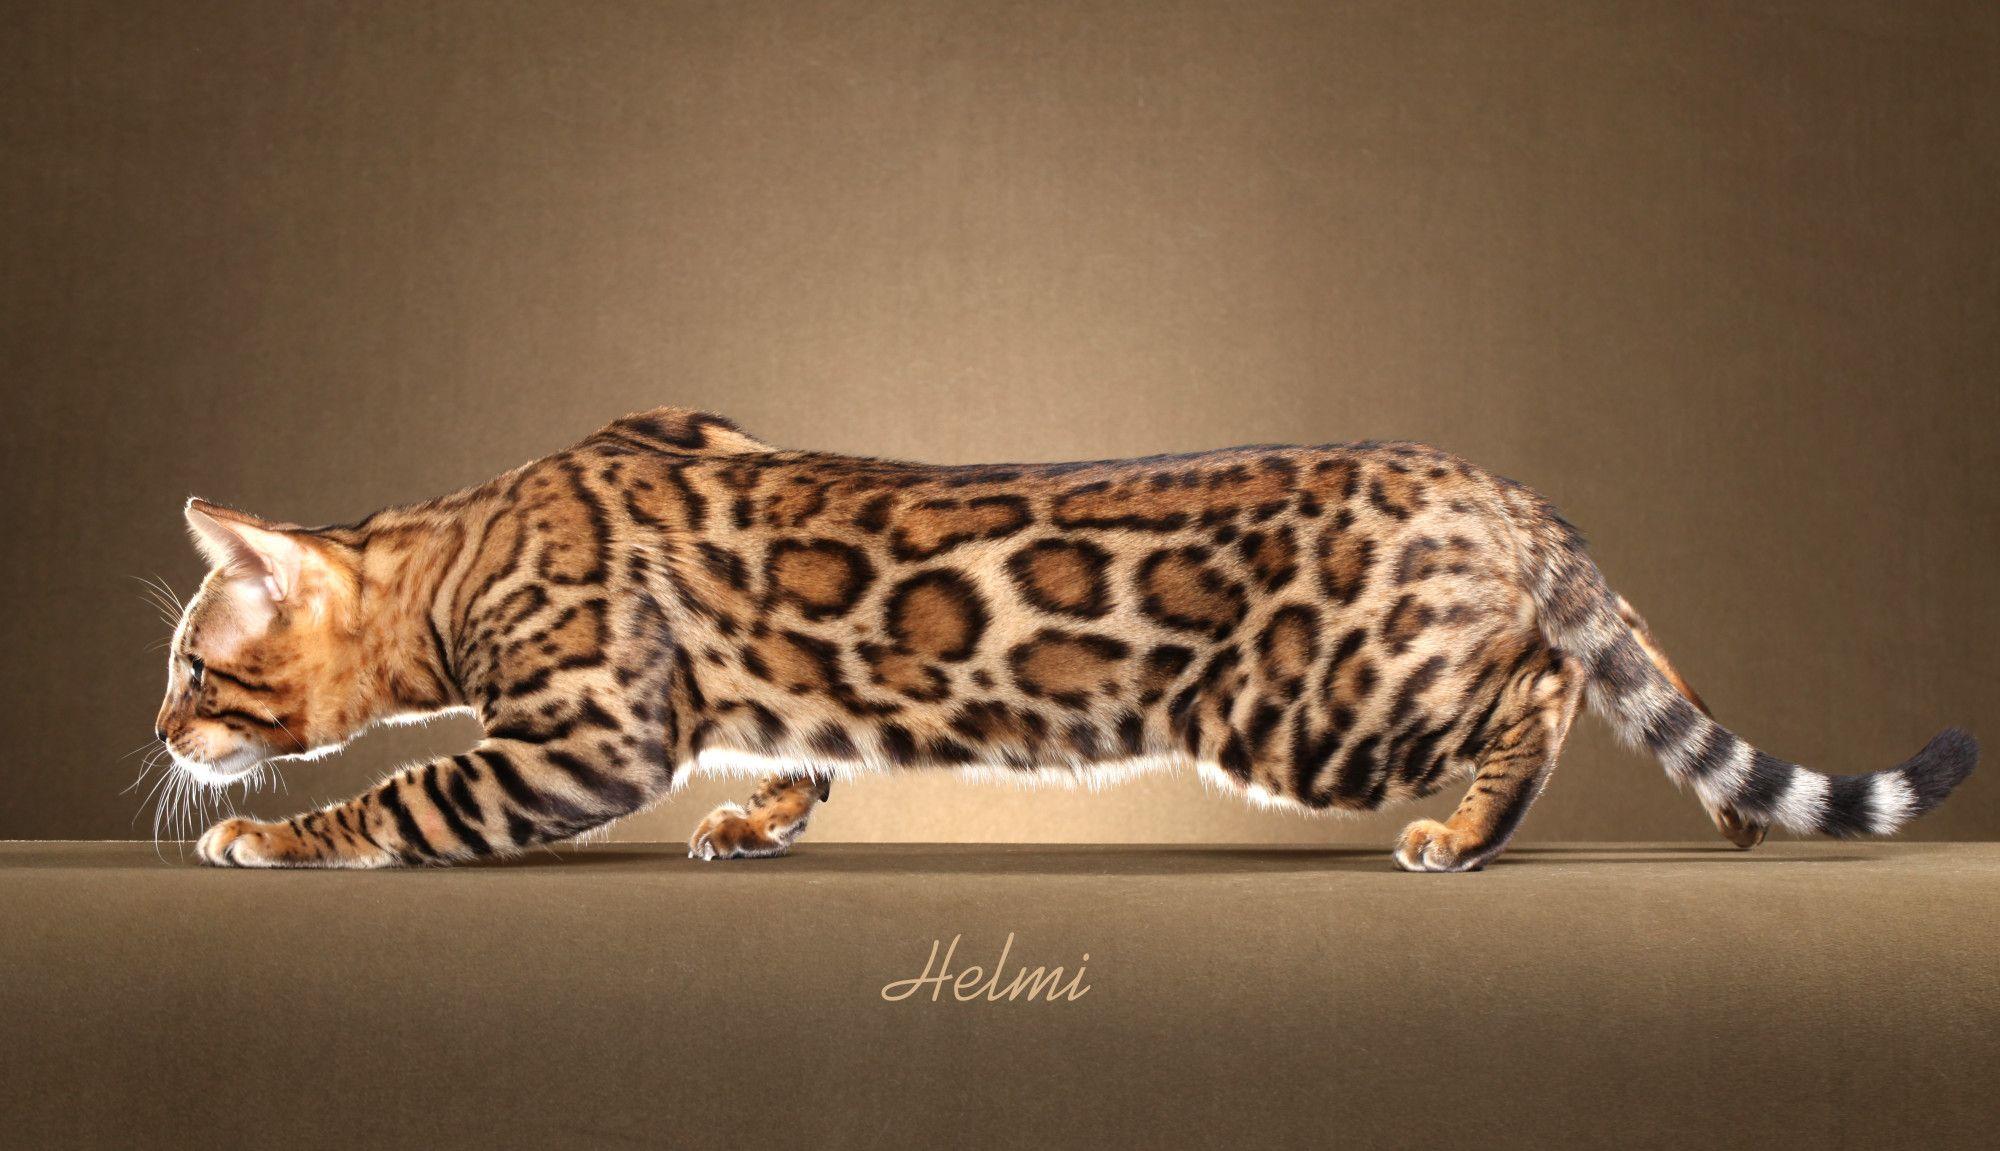 Bildergebnis für bengal cat rosette | black pads | Pinterest ...